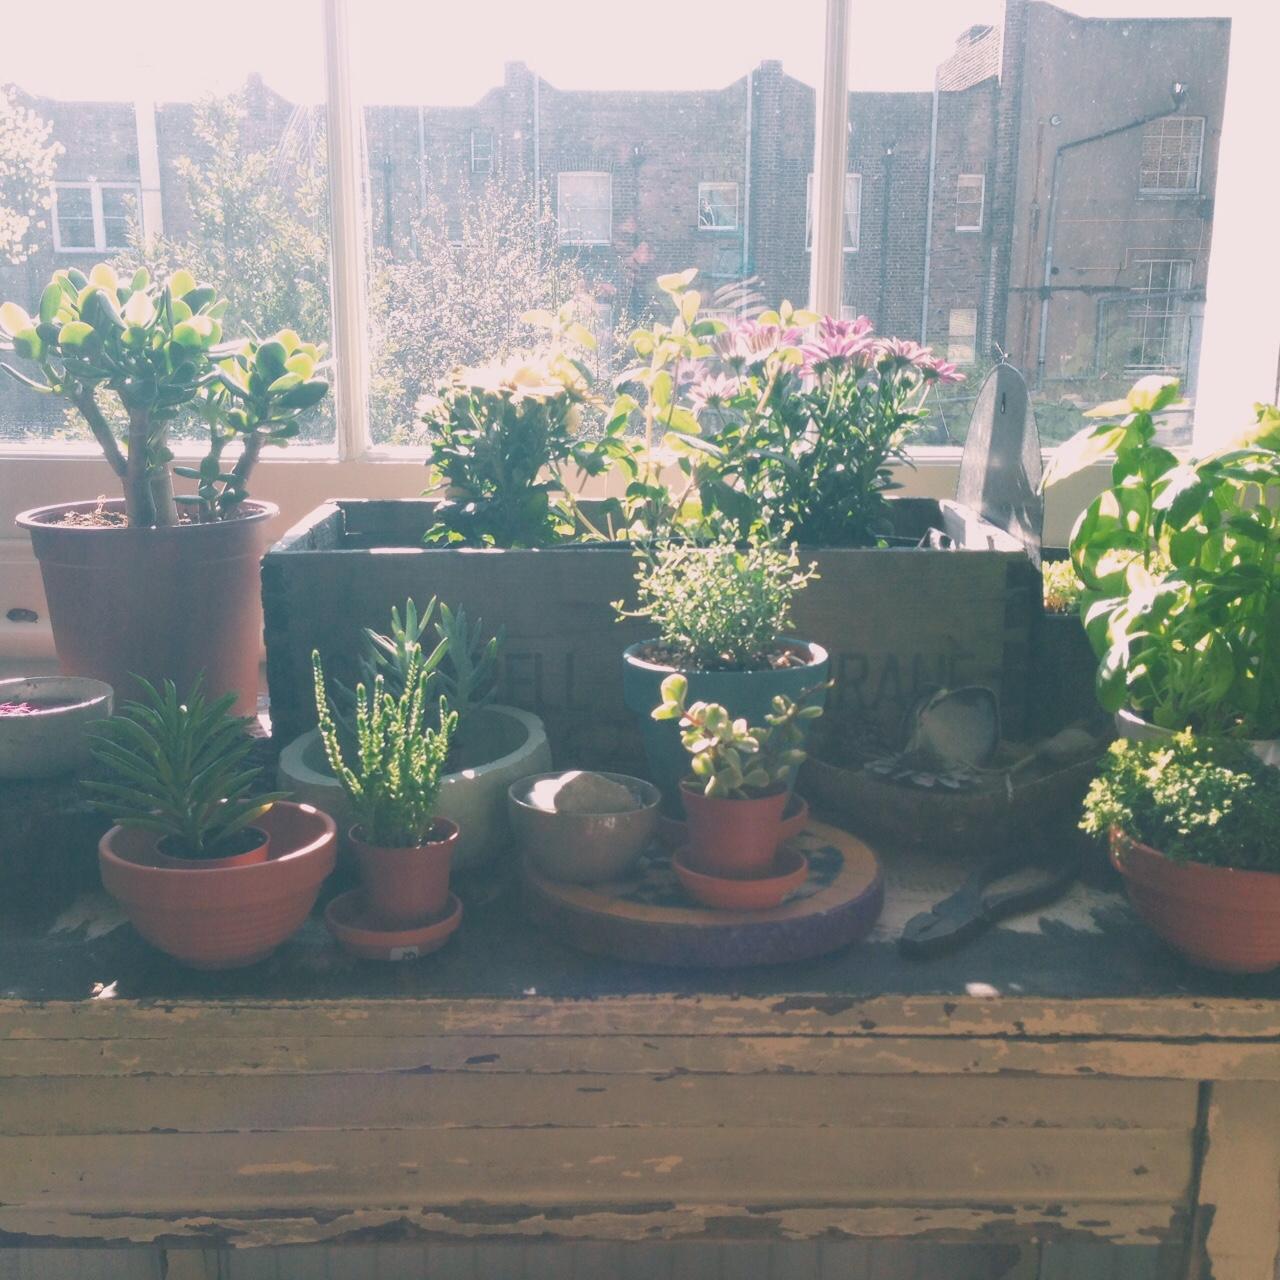 The kitchen window succulent display